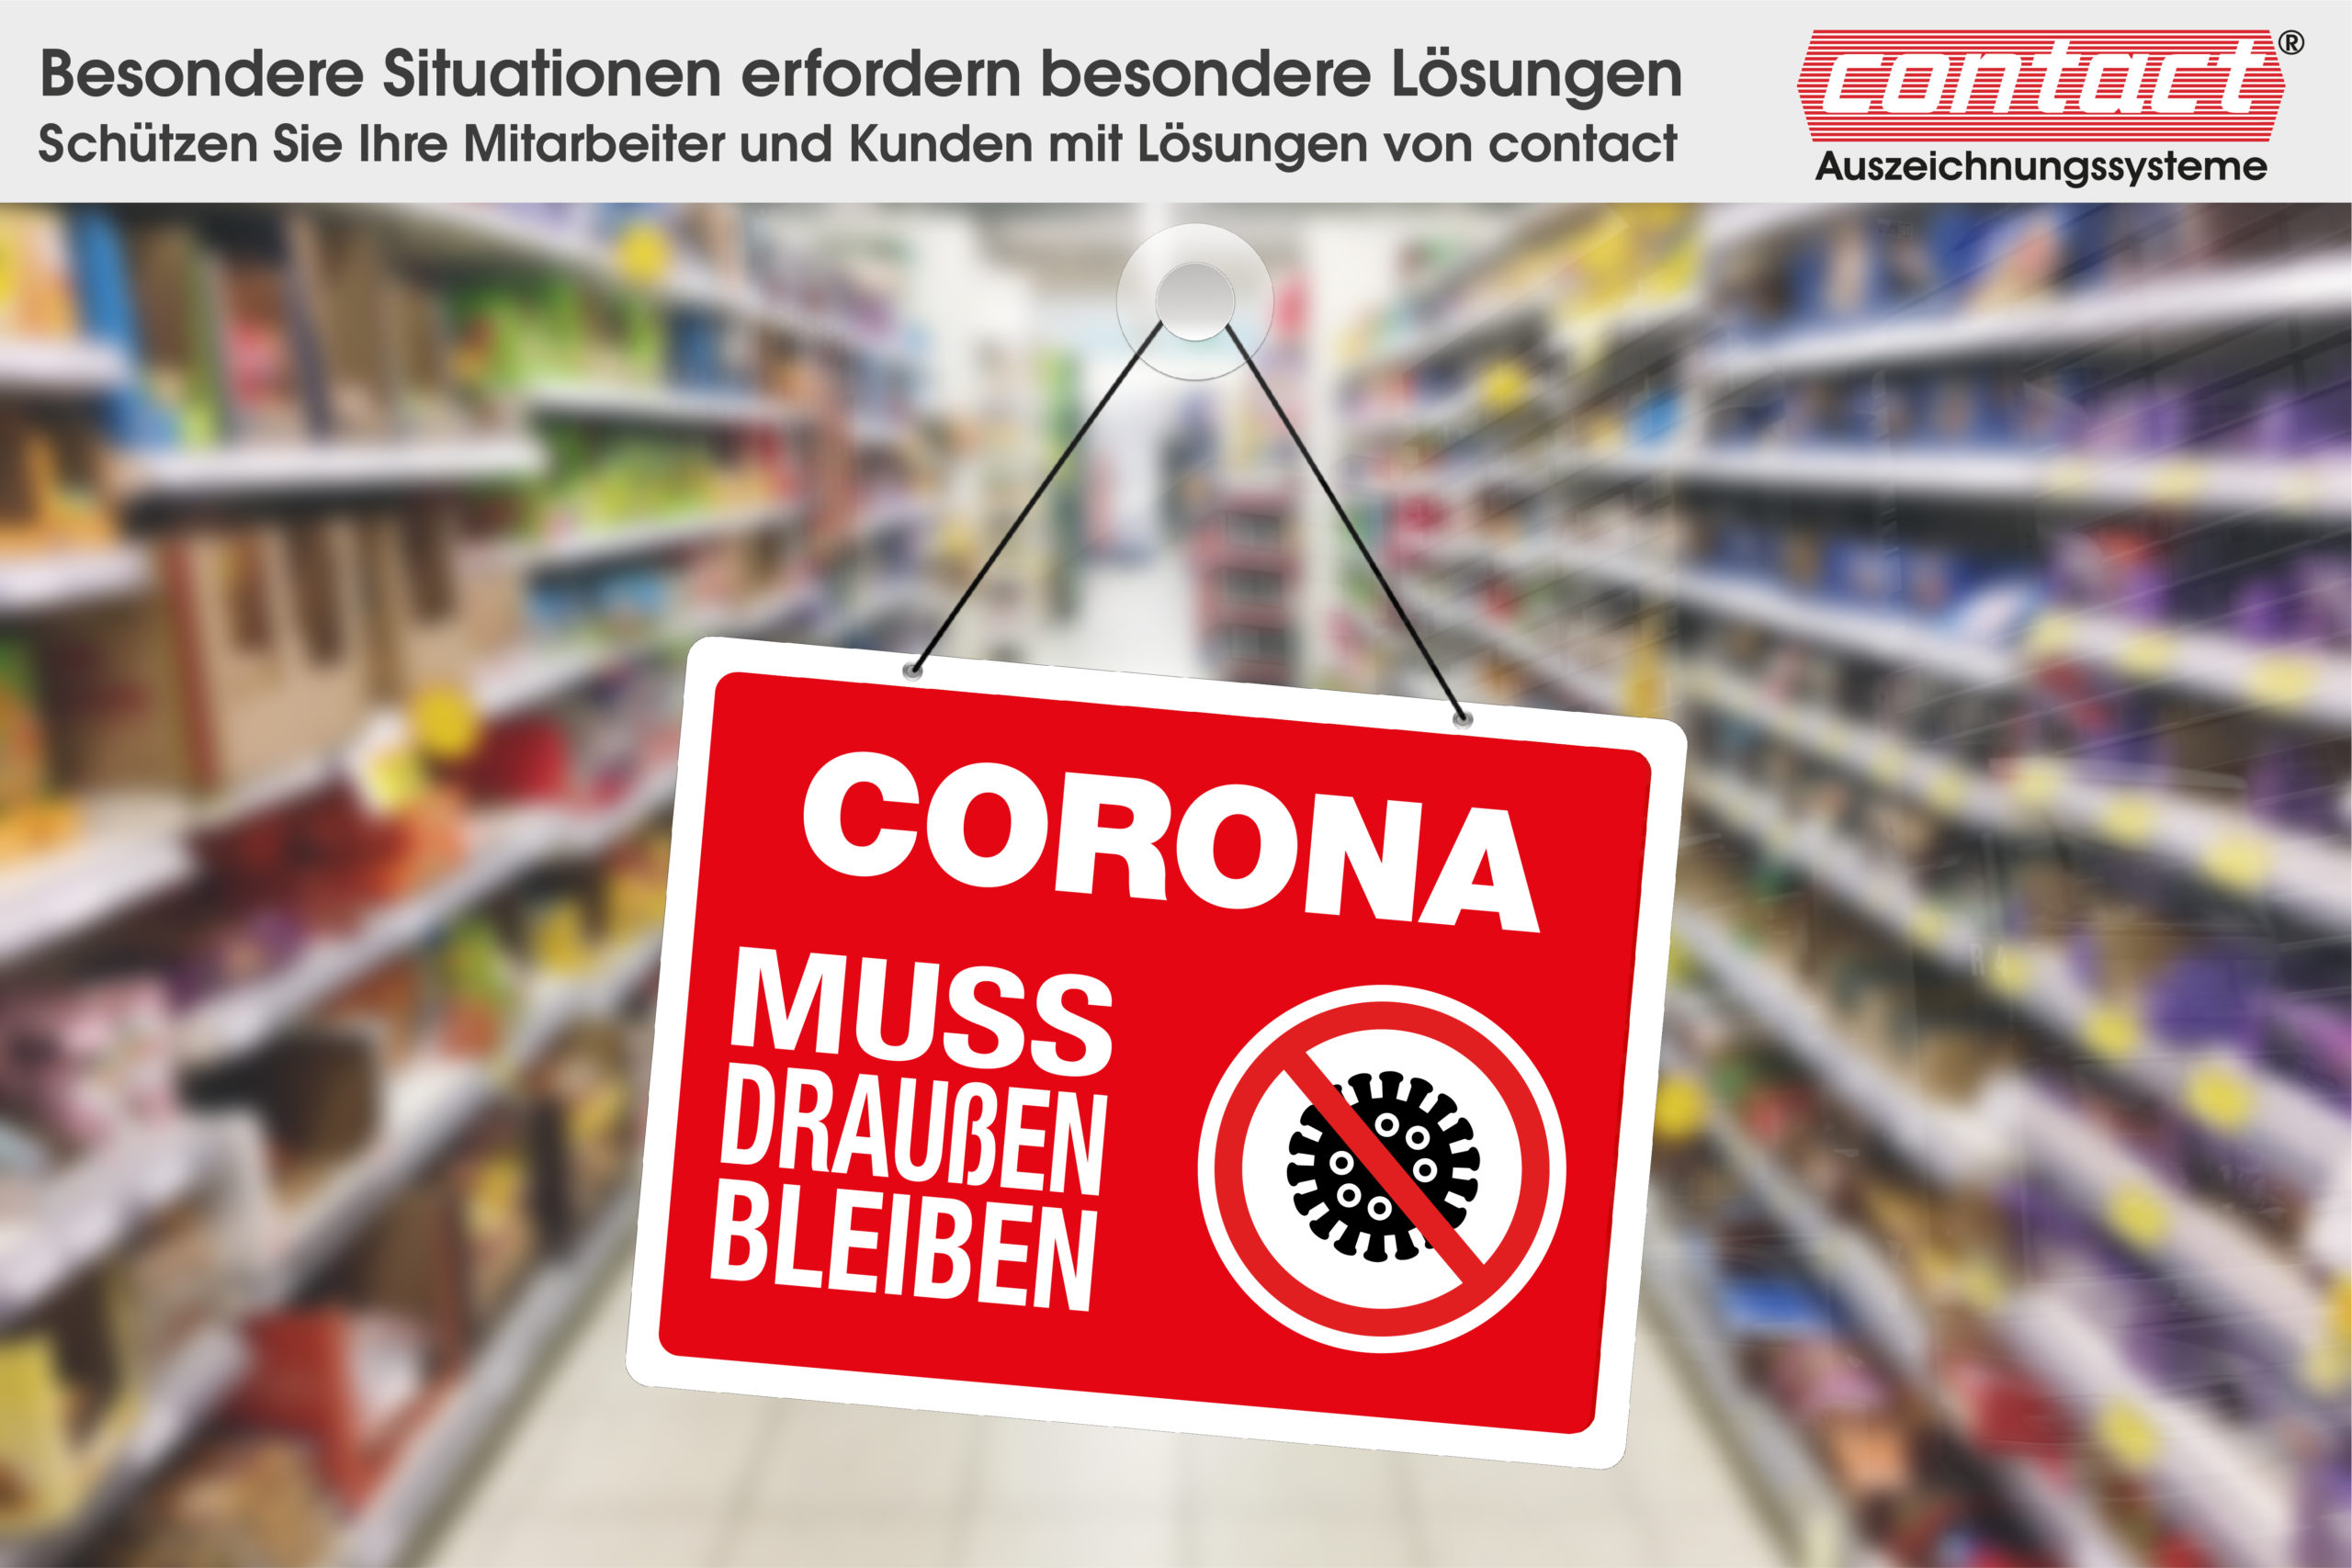 corona-schutzprodukte_contact news - contact Auszeichnungssysteme